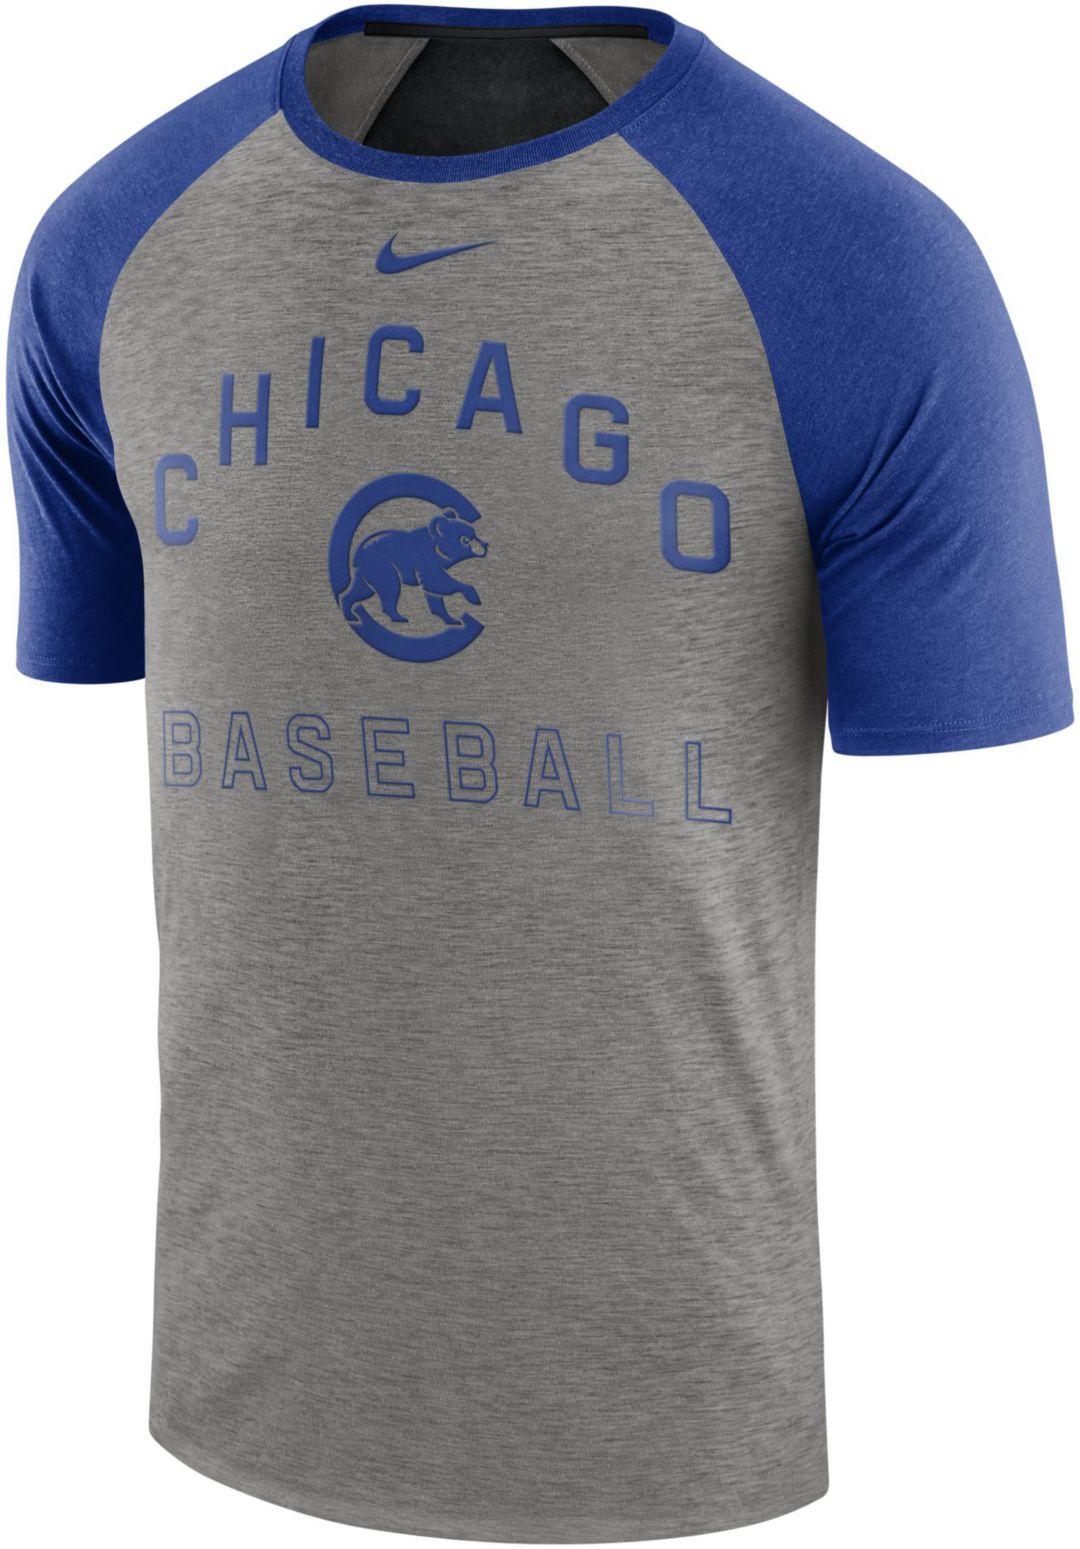 new products 0d488 8b59e Nike Men's Chicago Cubs Dri-FIT Slub Raglan T-Shirt